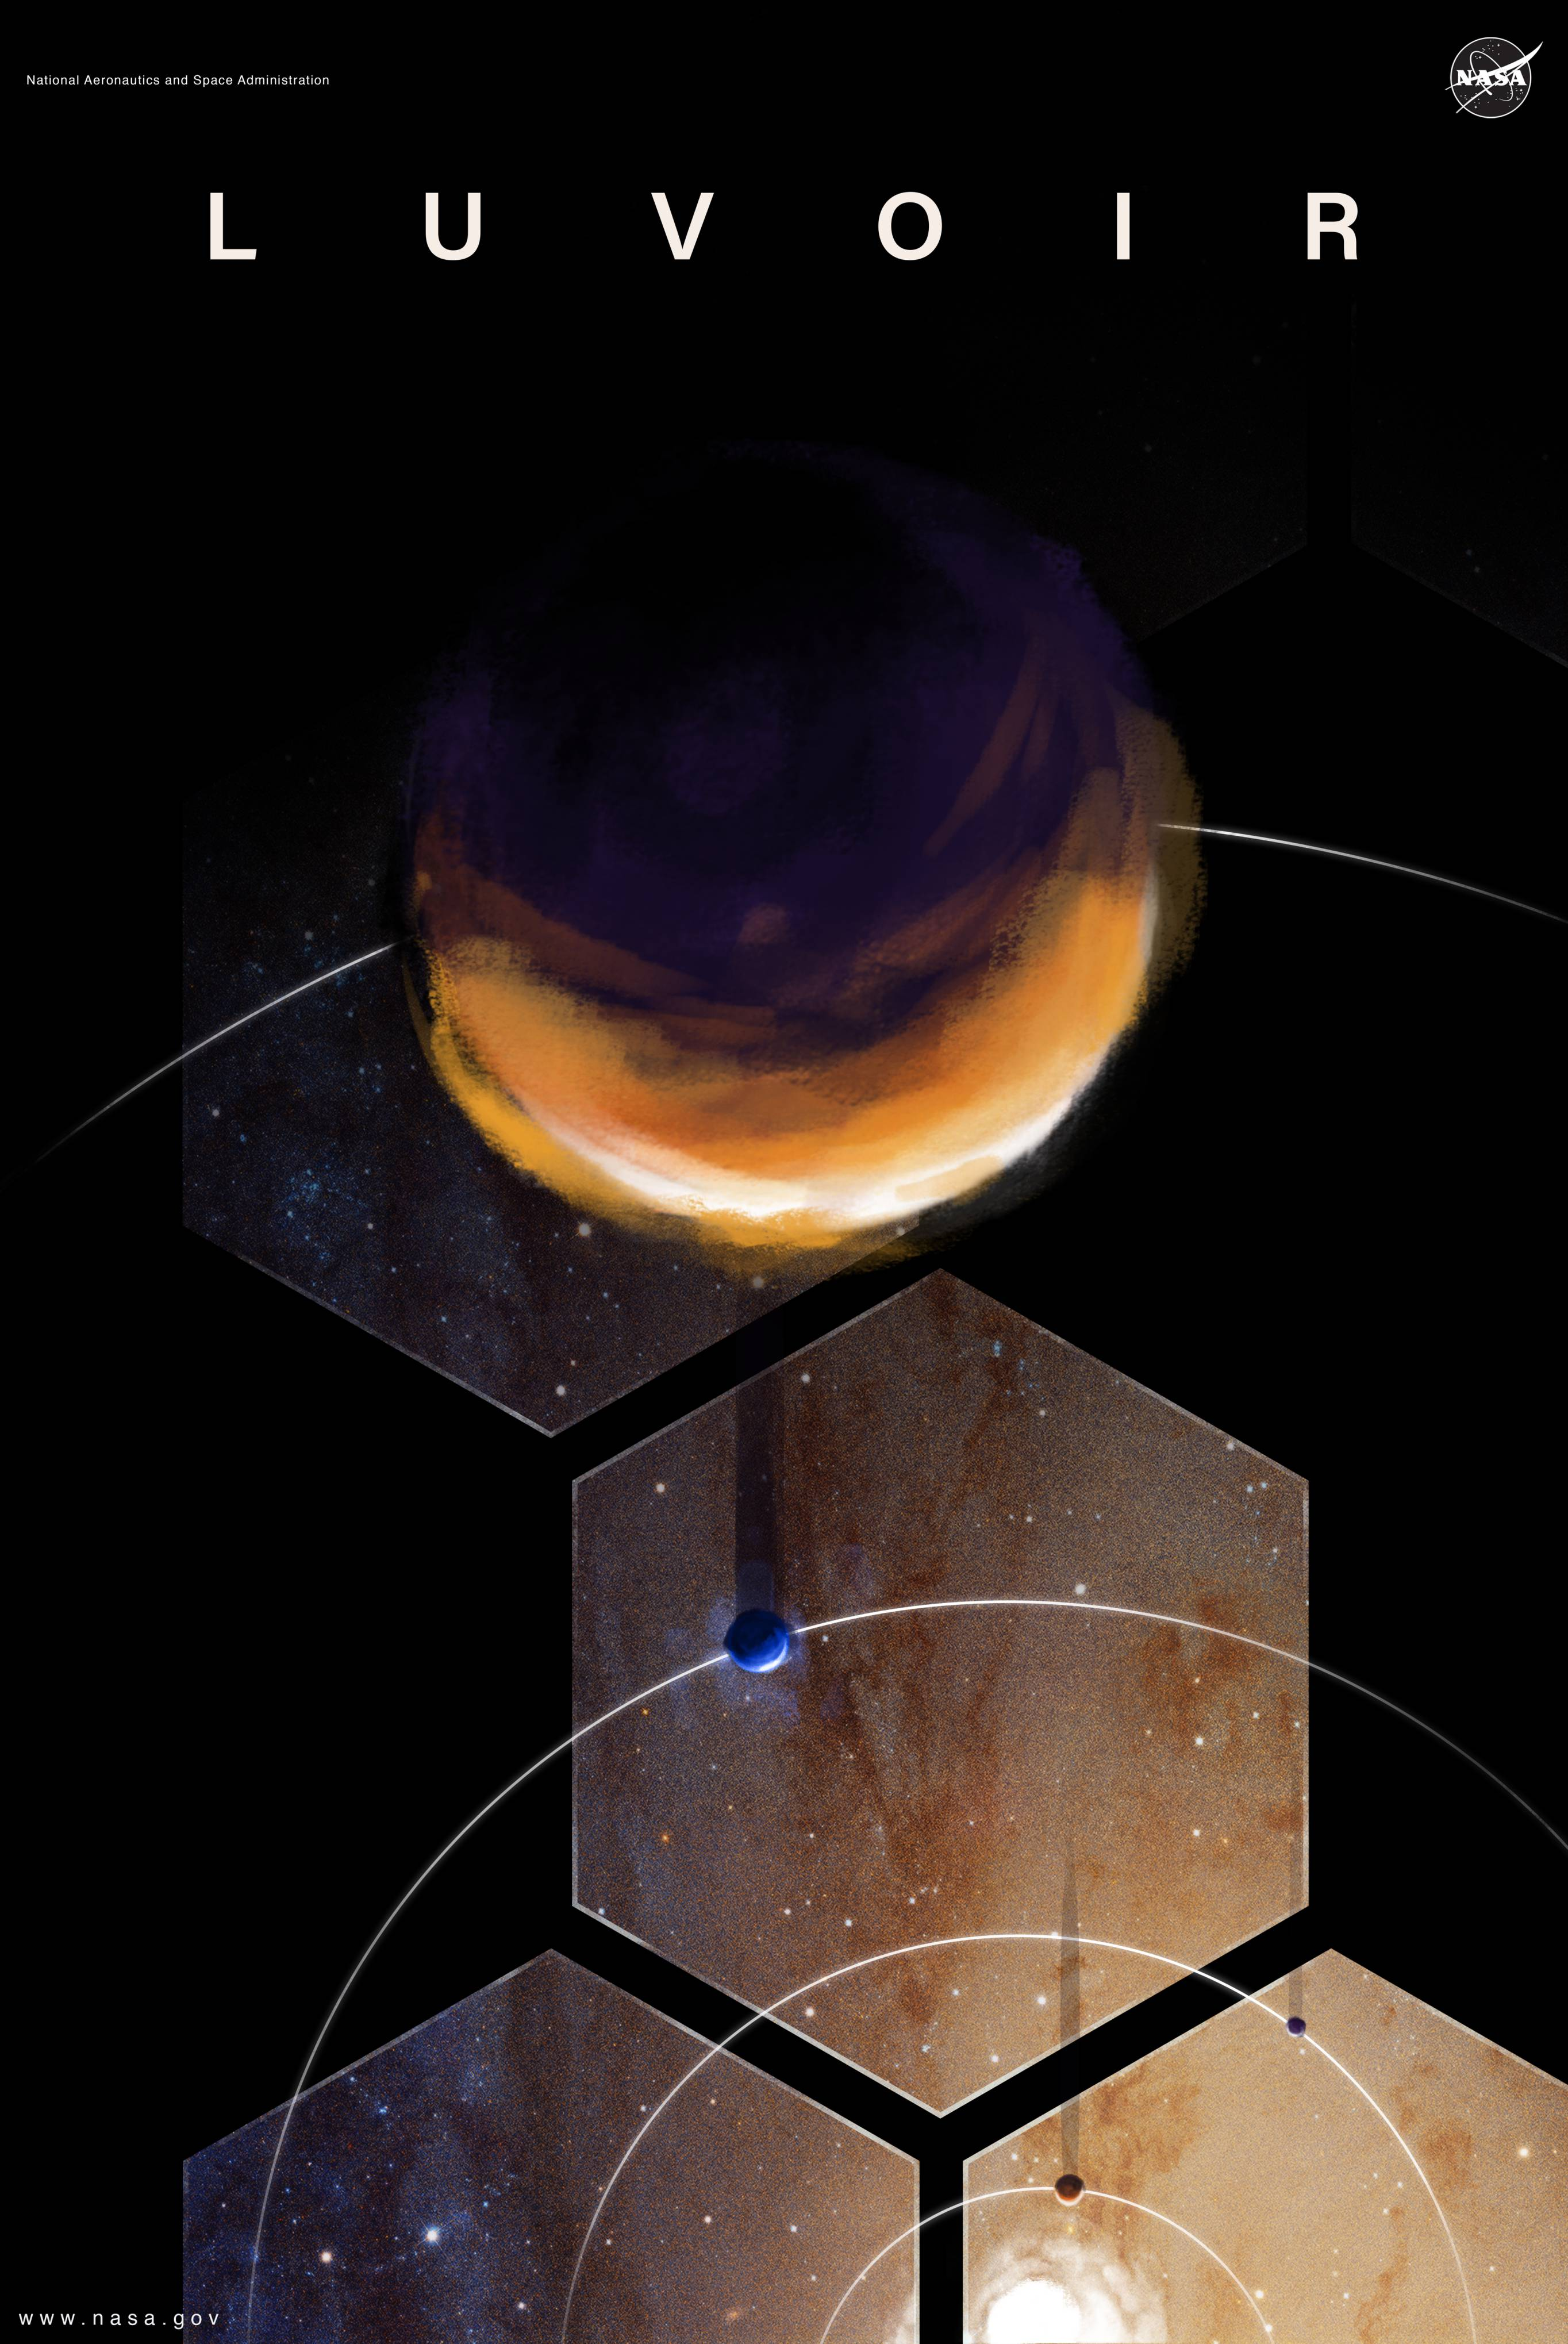 LUVOIR poster (NASA)